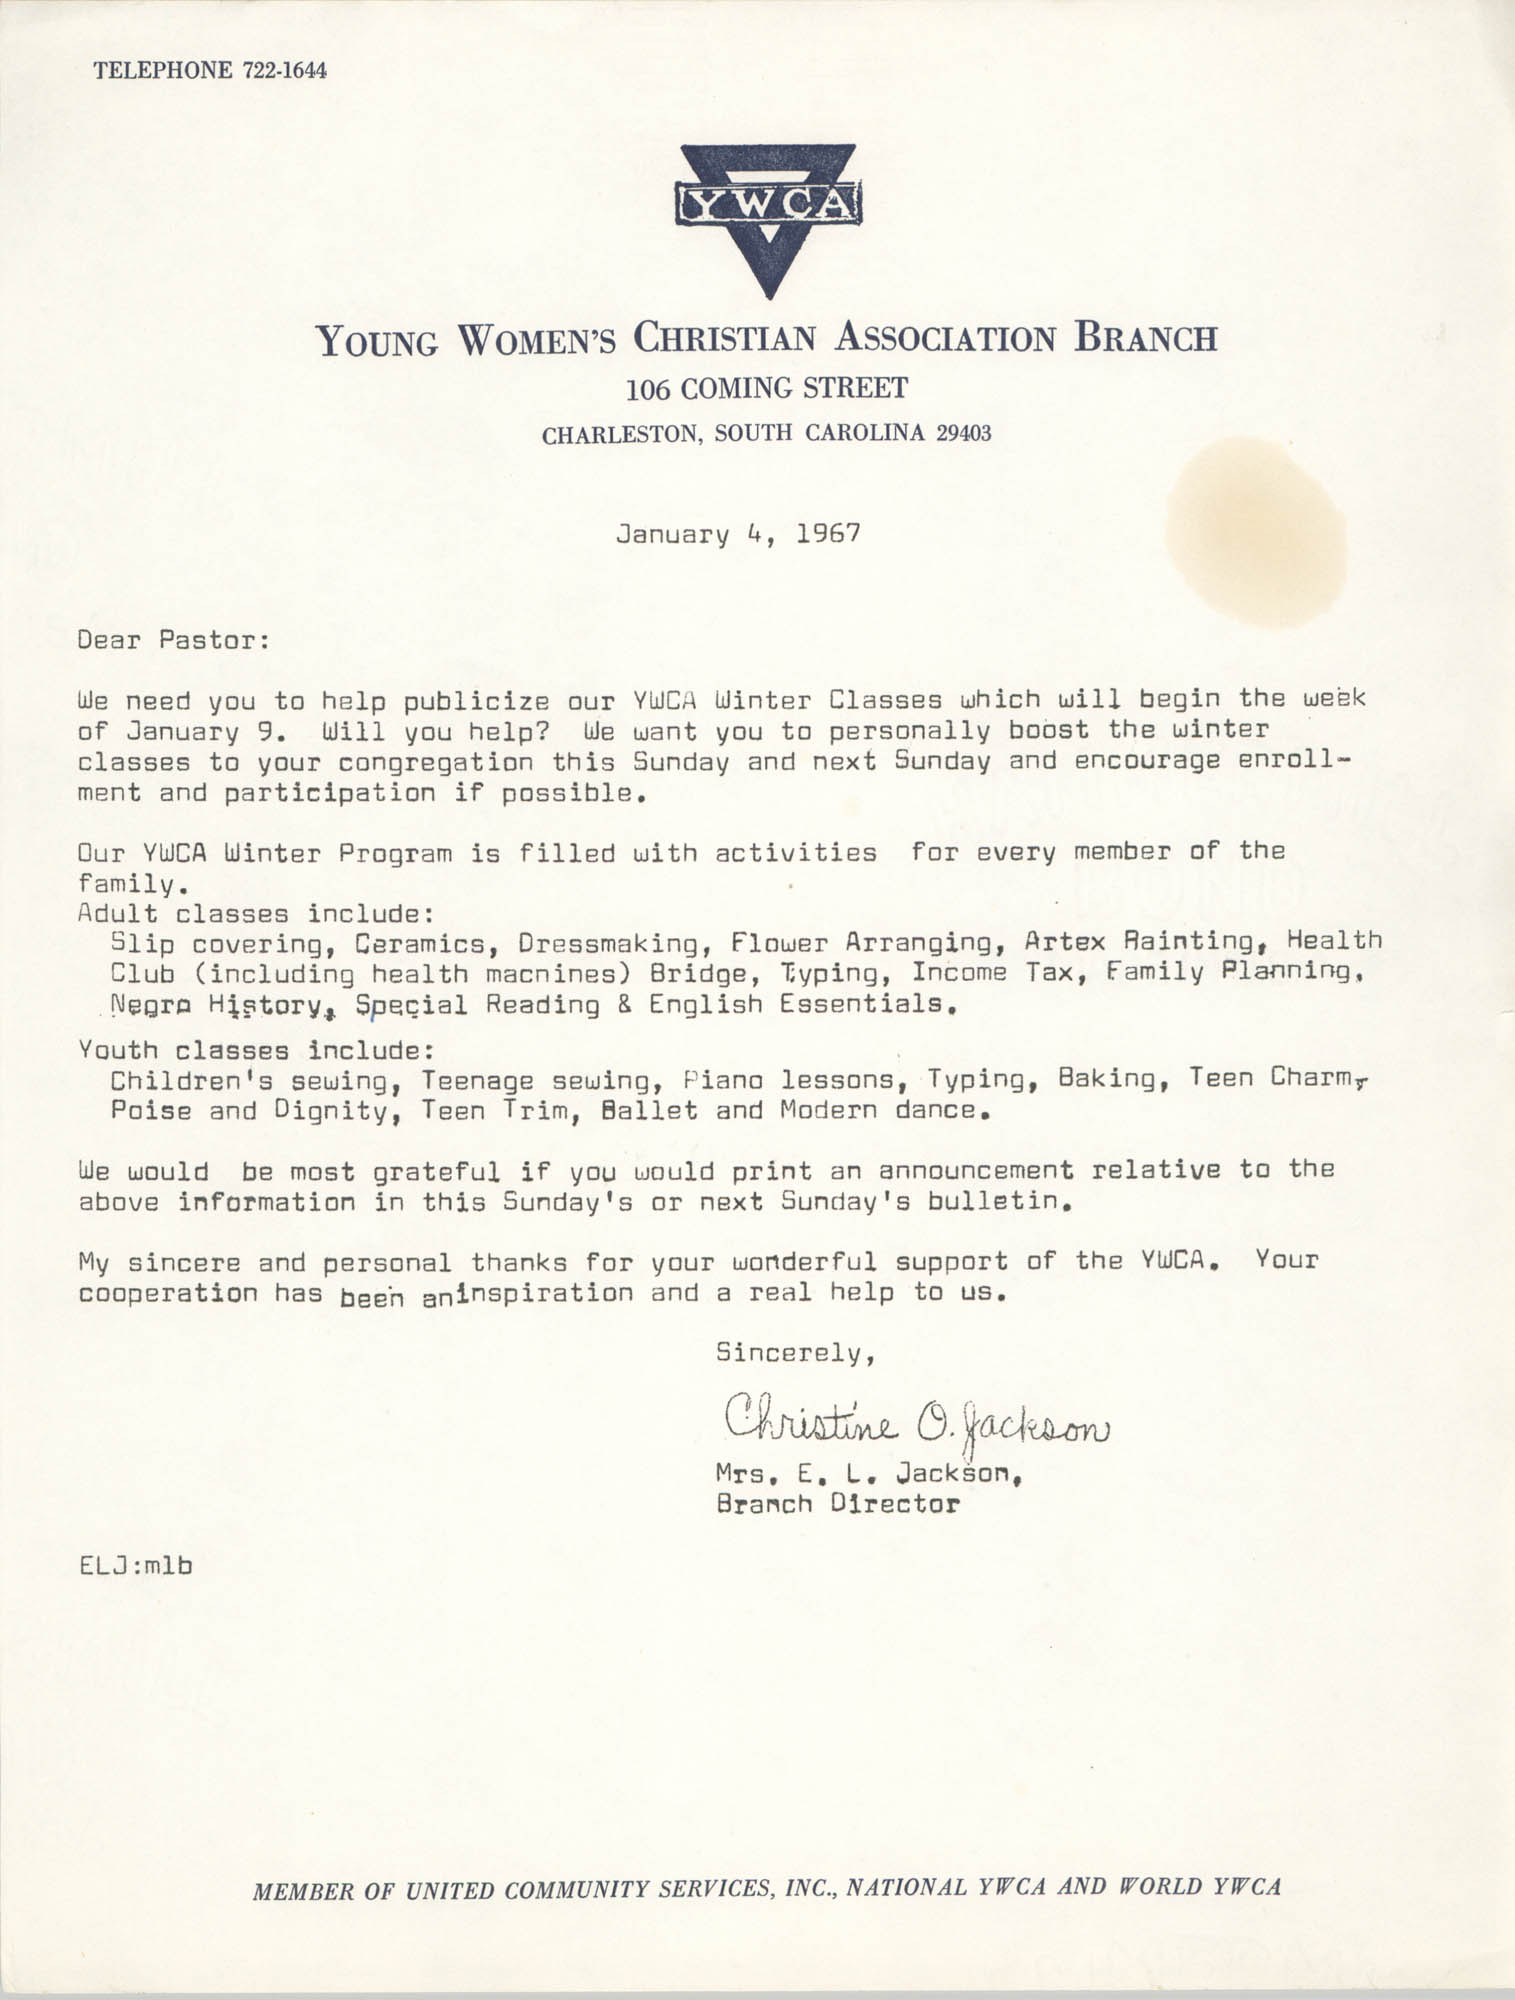 Letter from Christine O. Jackson to Arthur Jackson, January 4, 1967